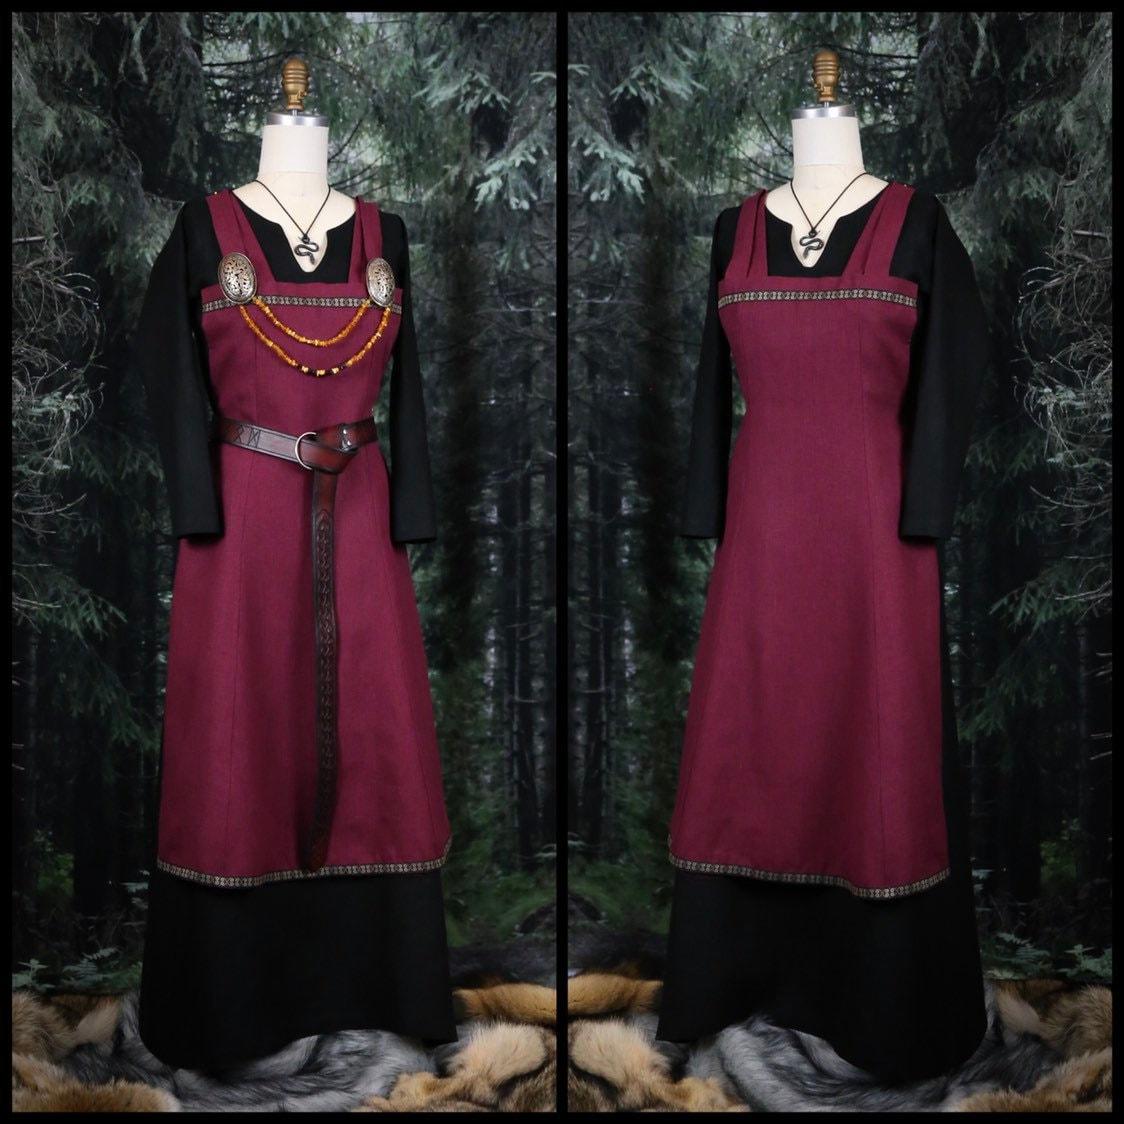 678de6cfeeb Viking linen Hangerock Apron Dress with trim. Perfect garb for Norse ...